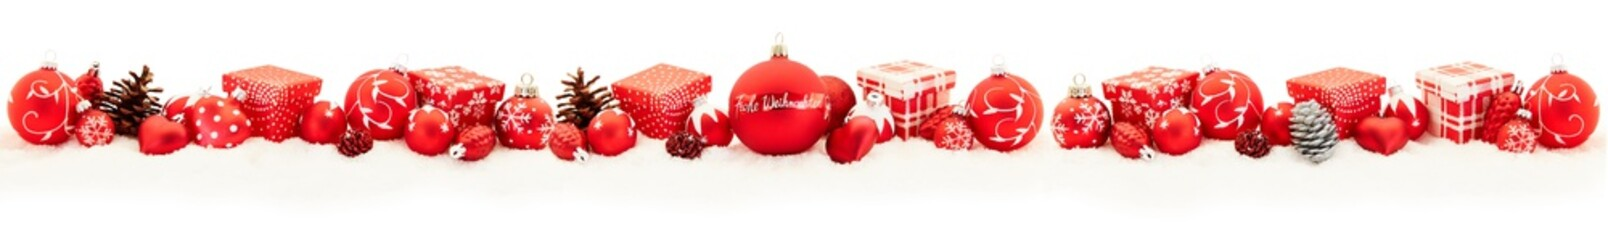 Frohe Weihnachten Panorama Rahmen in rot